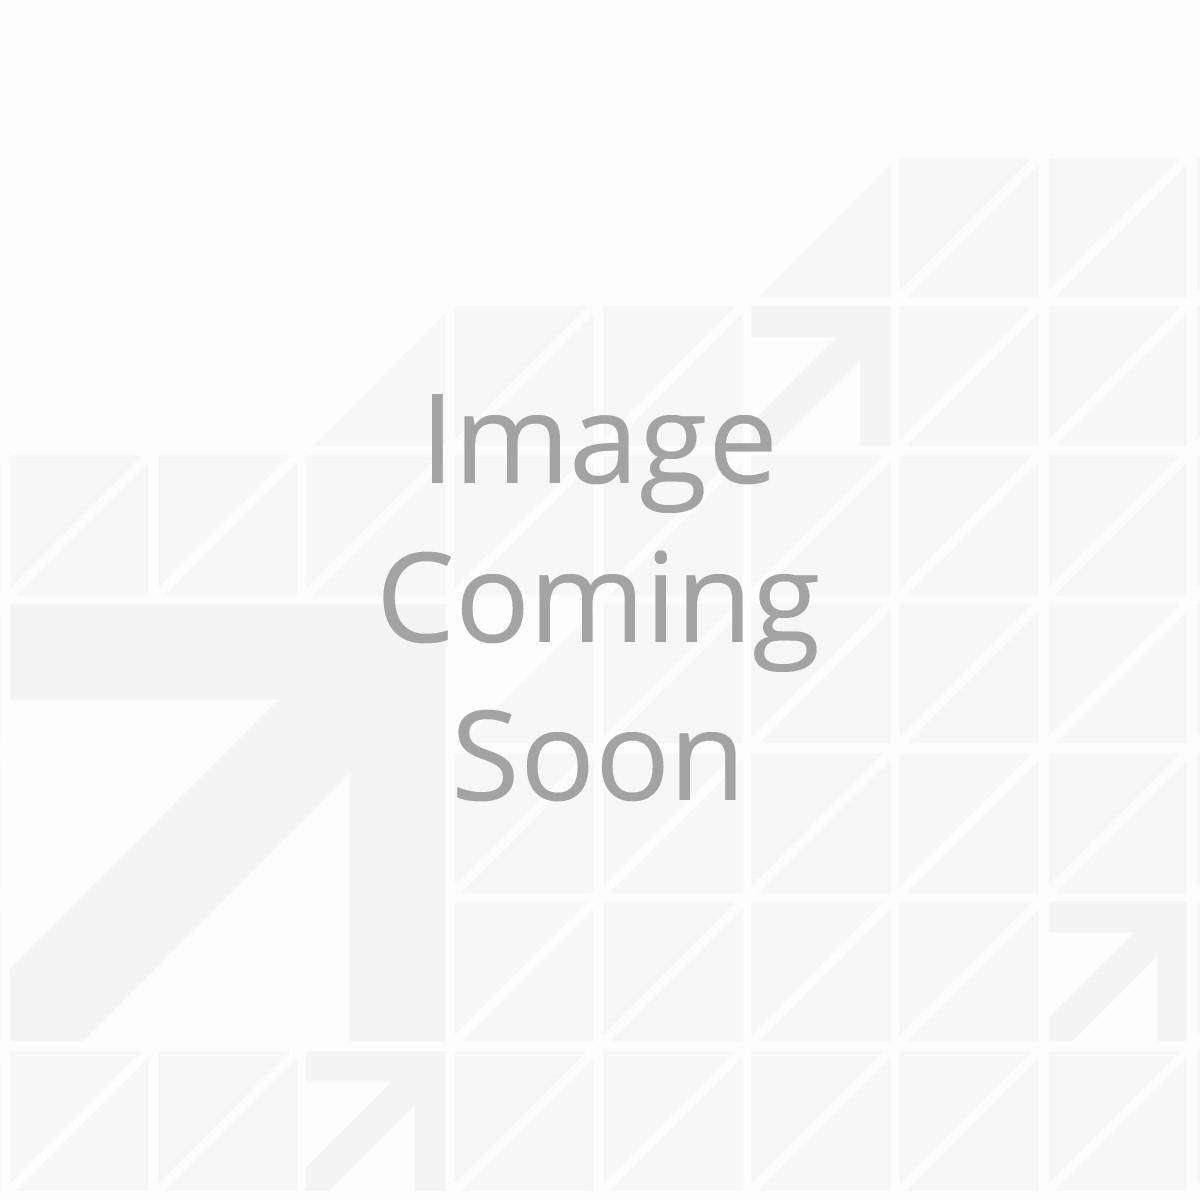 373965_Rack-Mount-Kit_001